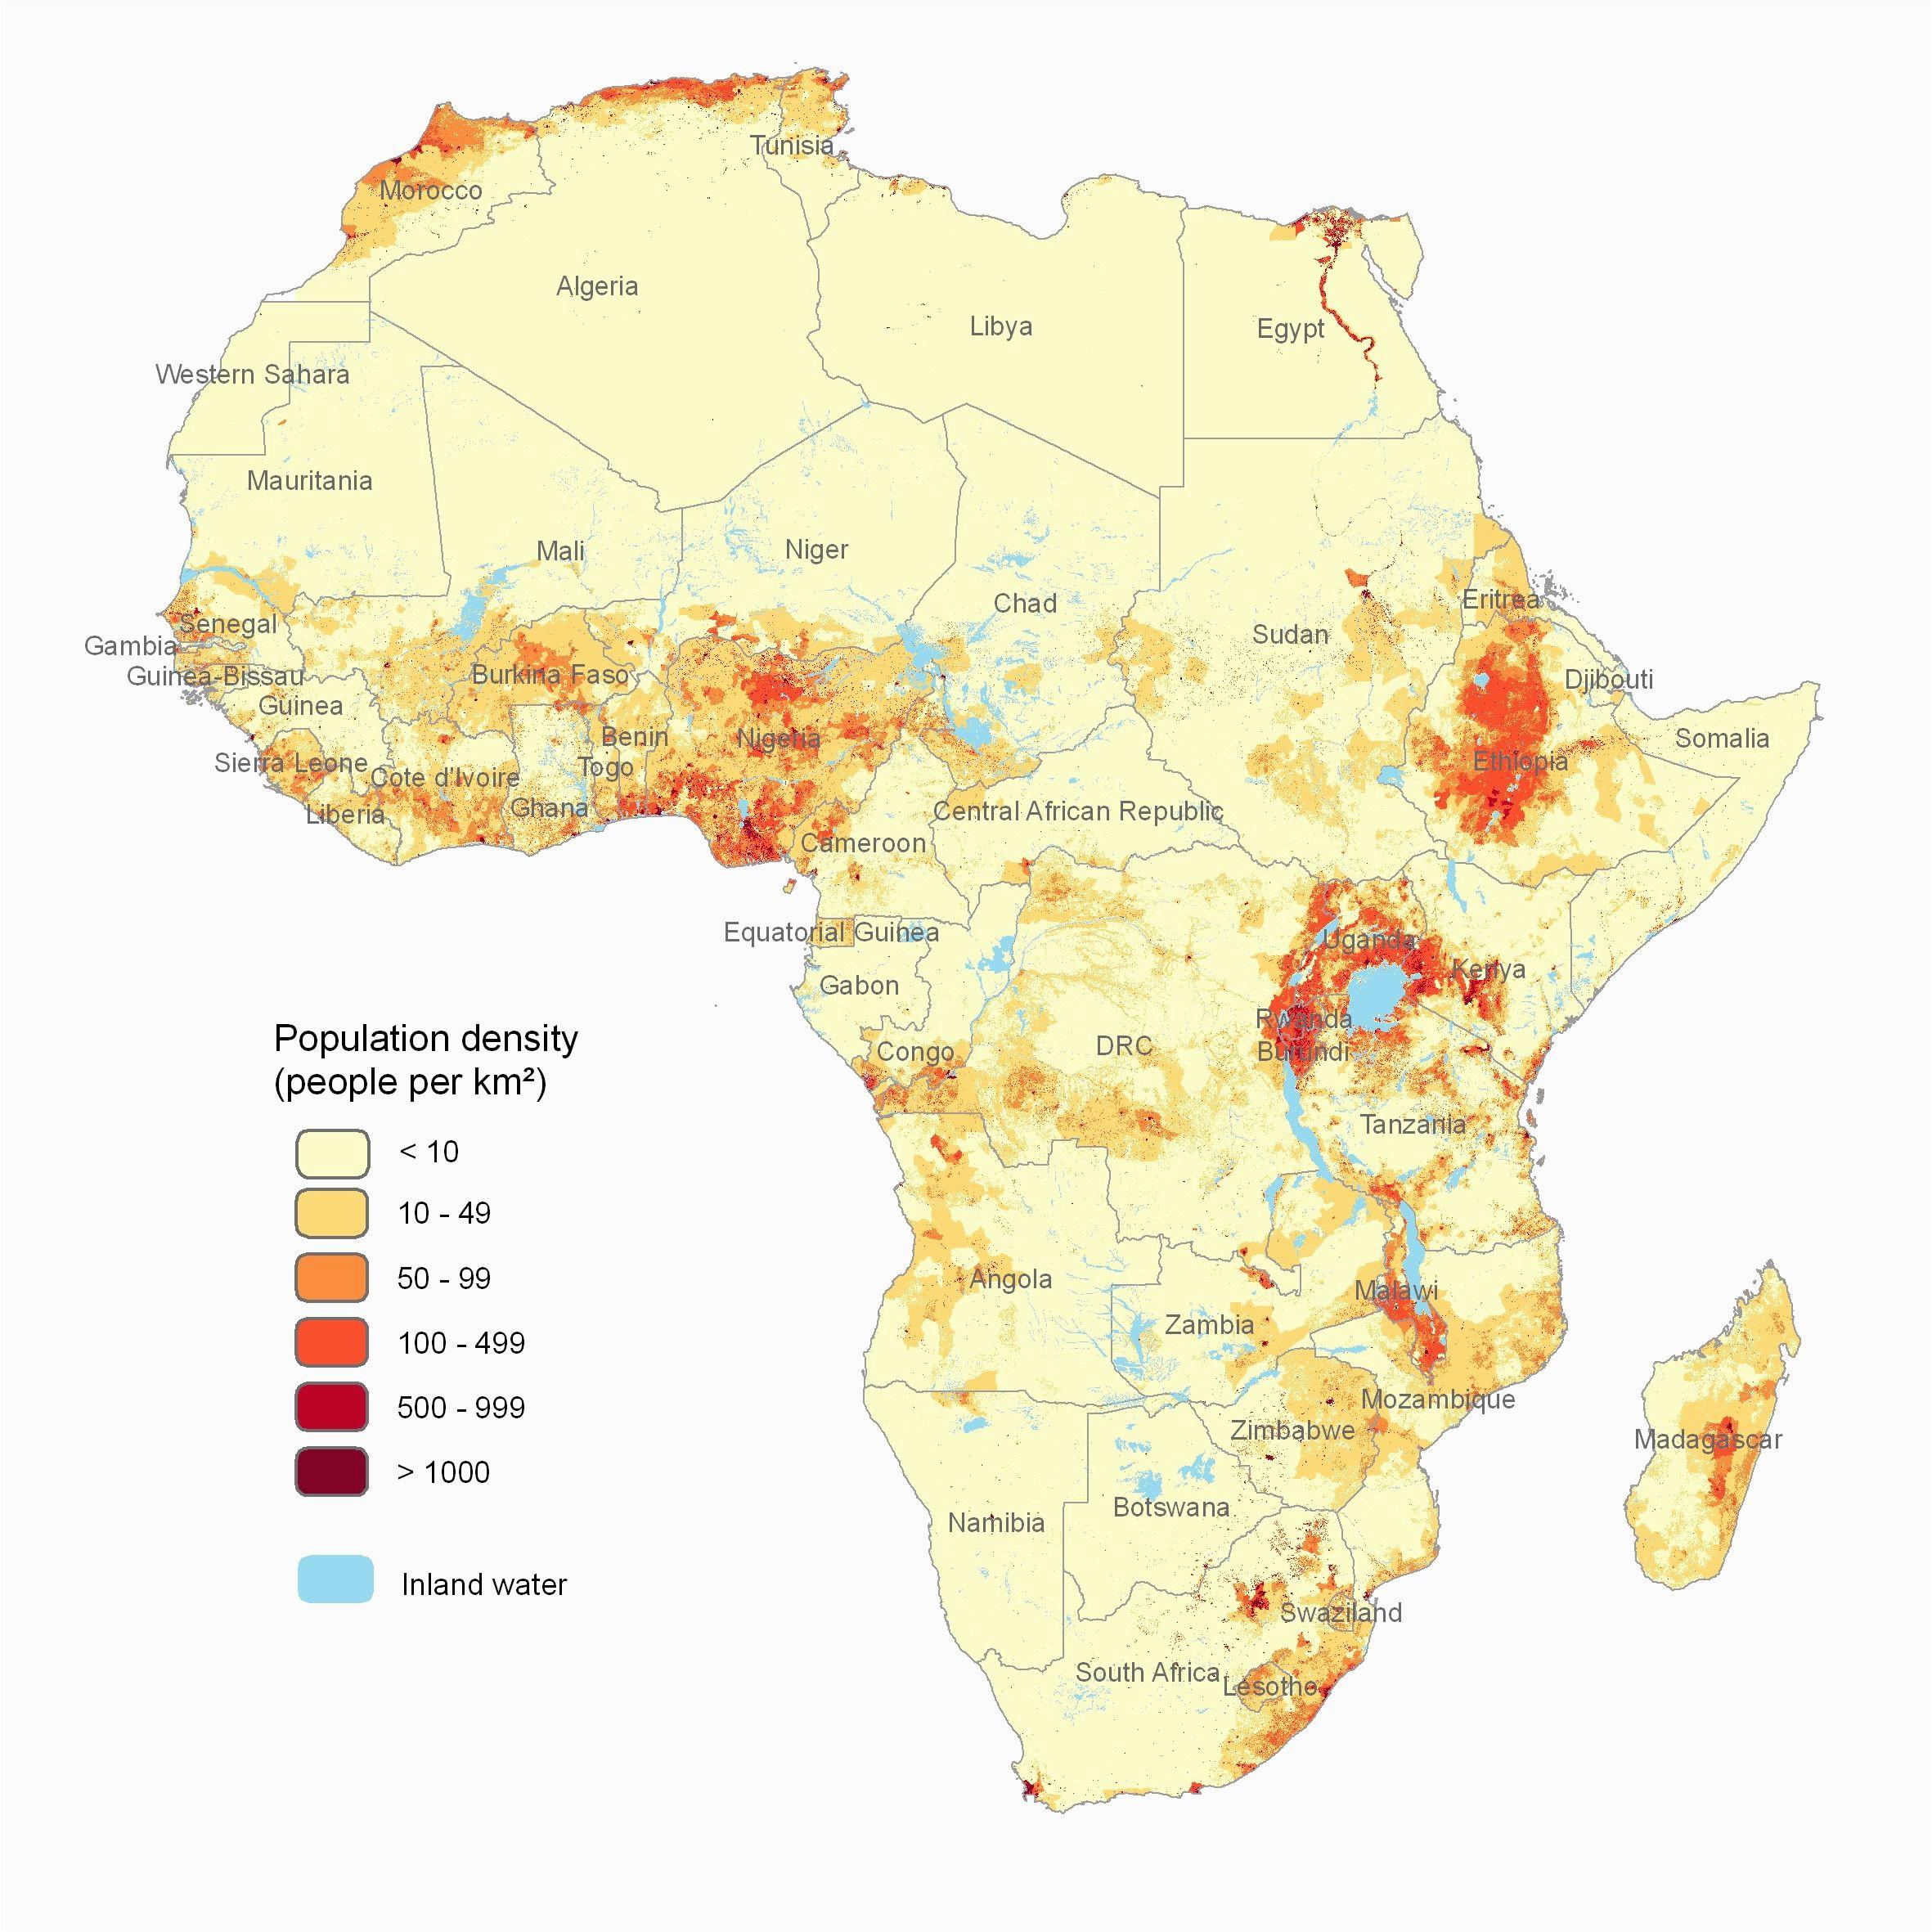 North Africa Population Density Map.Population Density Map England Secretmuseum